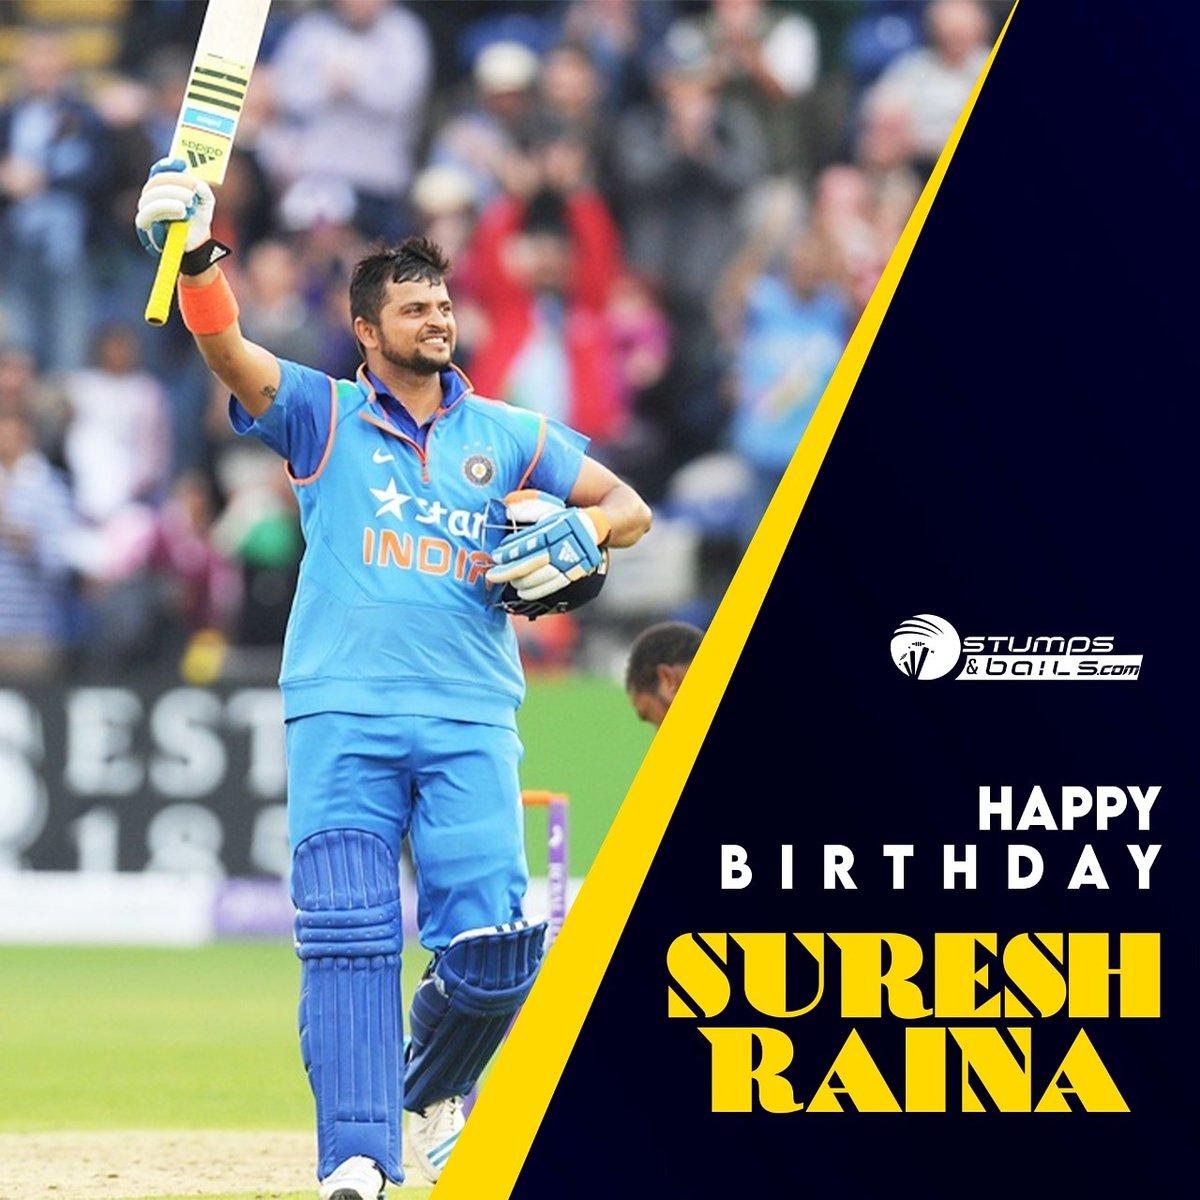 Happy Birthday #SureshRaina  Follow us @stumpnbails #SureshRaina #HappyBirthdaySureshRaina #Indiancricketer #cricketerbirthday